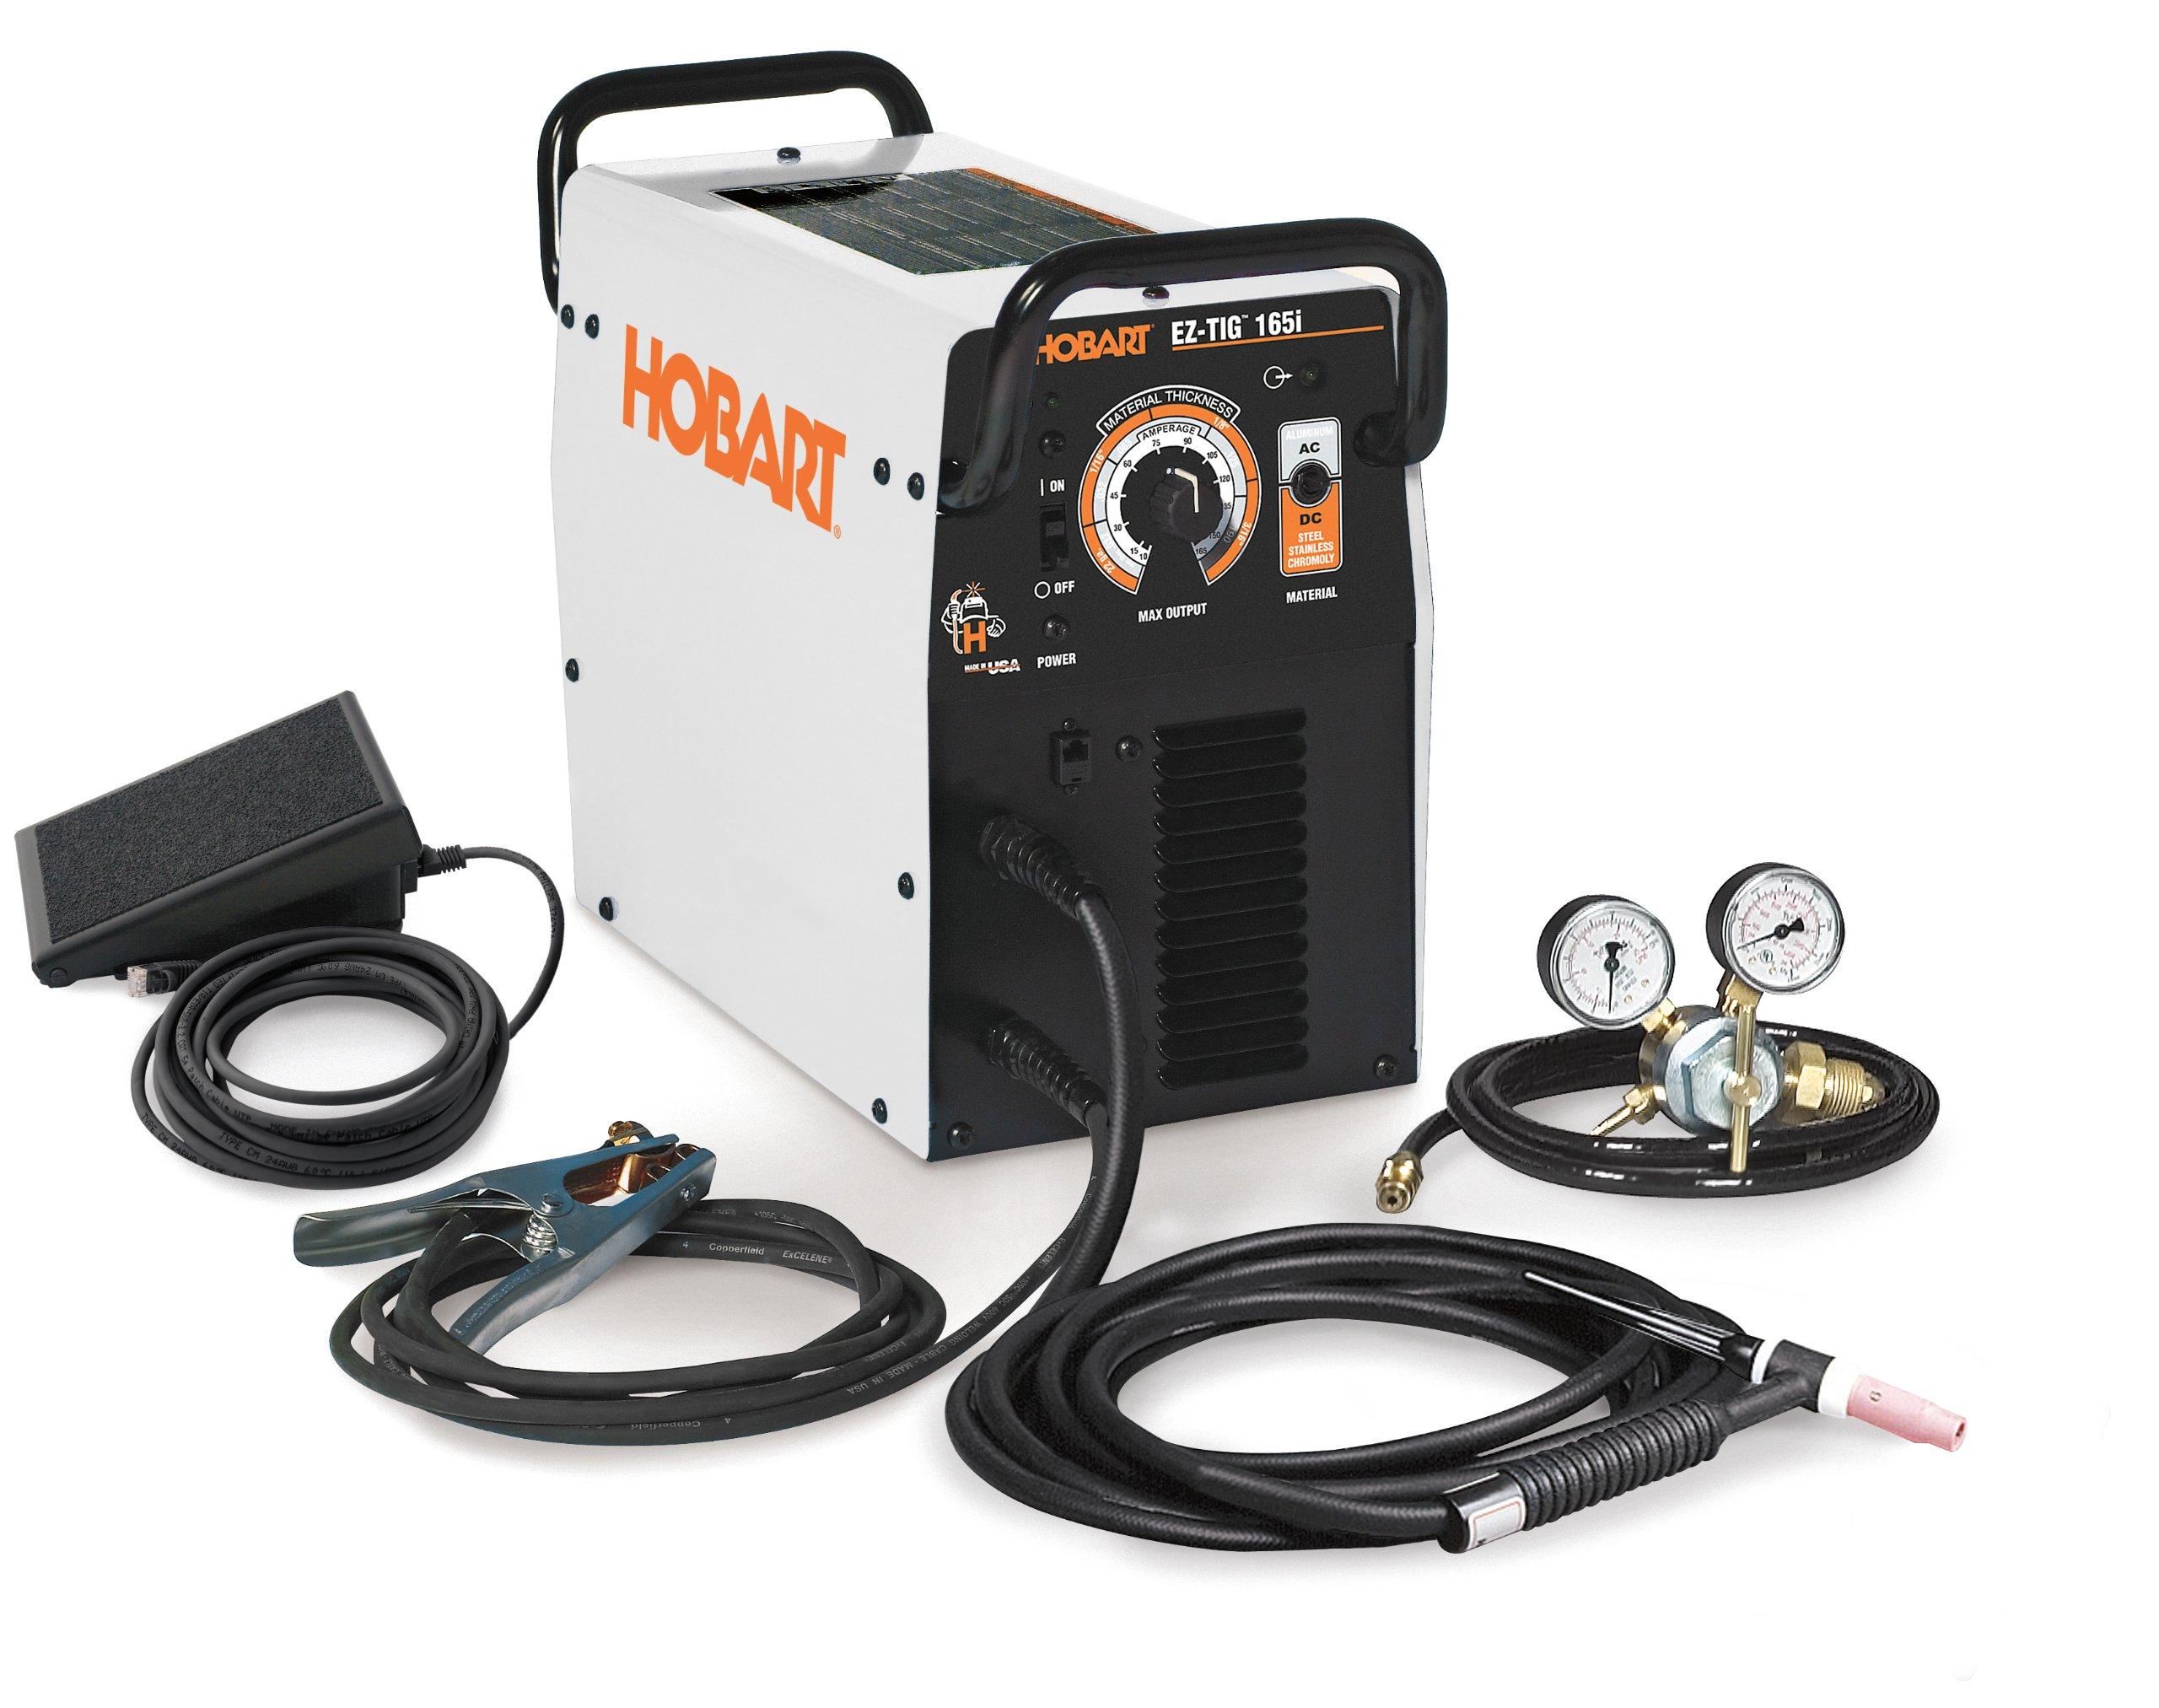 Hobart 500551 Ez Tig 165i Ac Dc Welder 230v Mig Welding 250ex Wiring Diagram Equipment